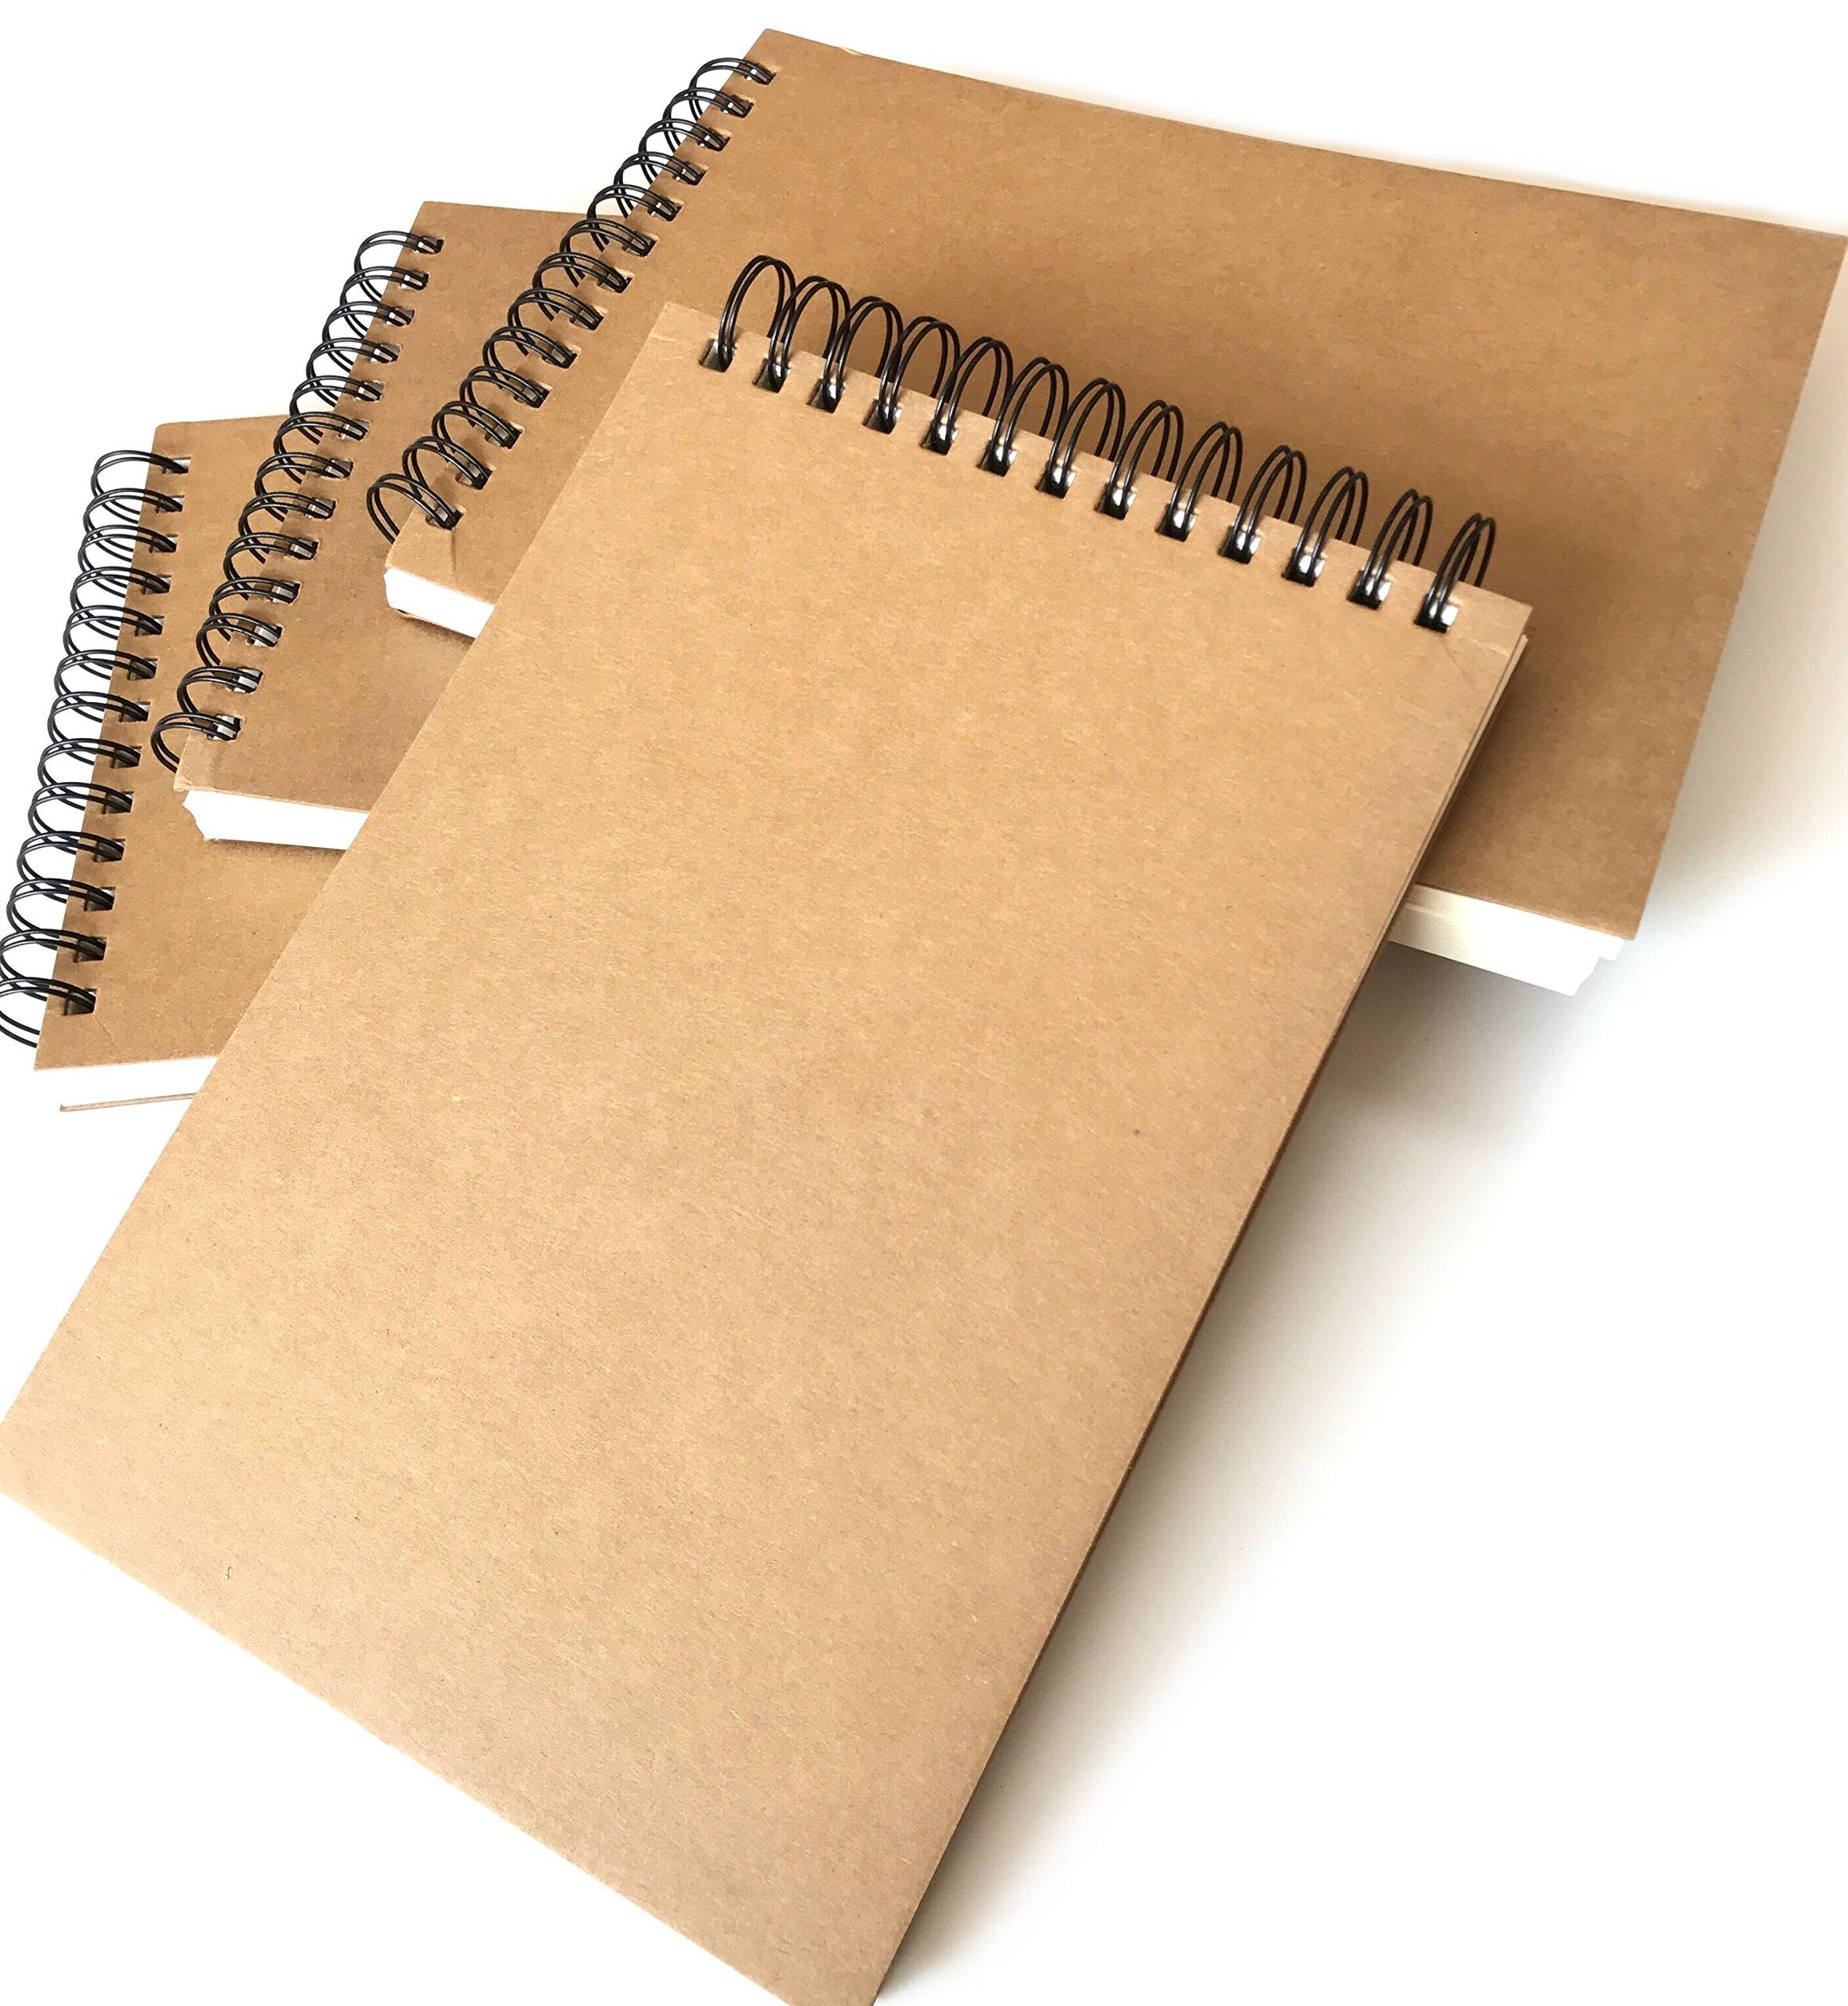 VEEPPO Super Thick Spiral Bound Notebooks 700g Hard Kraft Cover 160g Thick Paper Super Big Ring Wire Bound Blank Sketch Notebook (4 Pack B5-18.5 x 26cm)